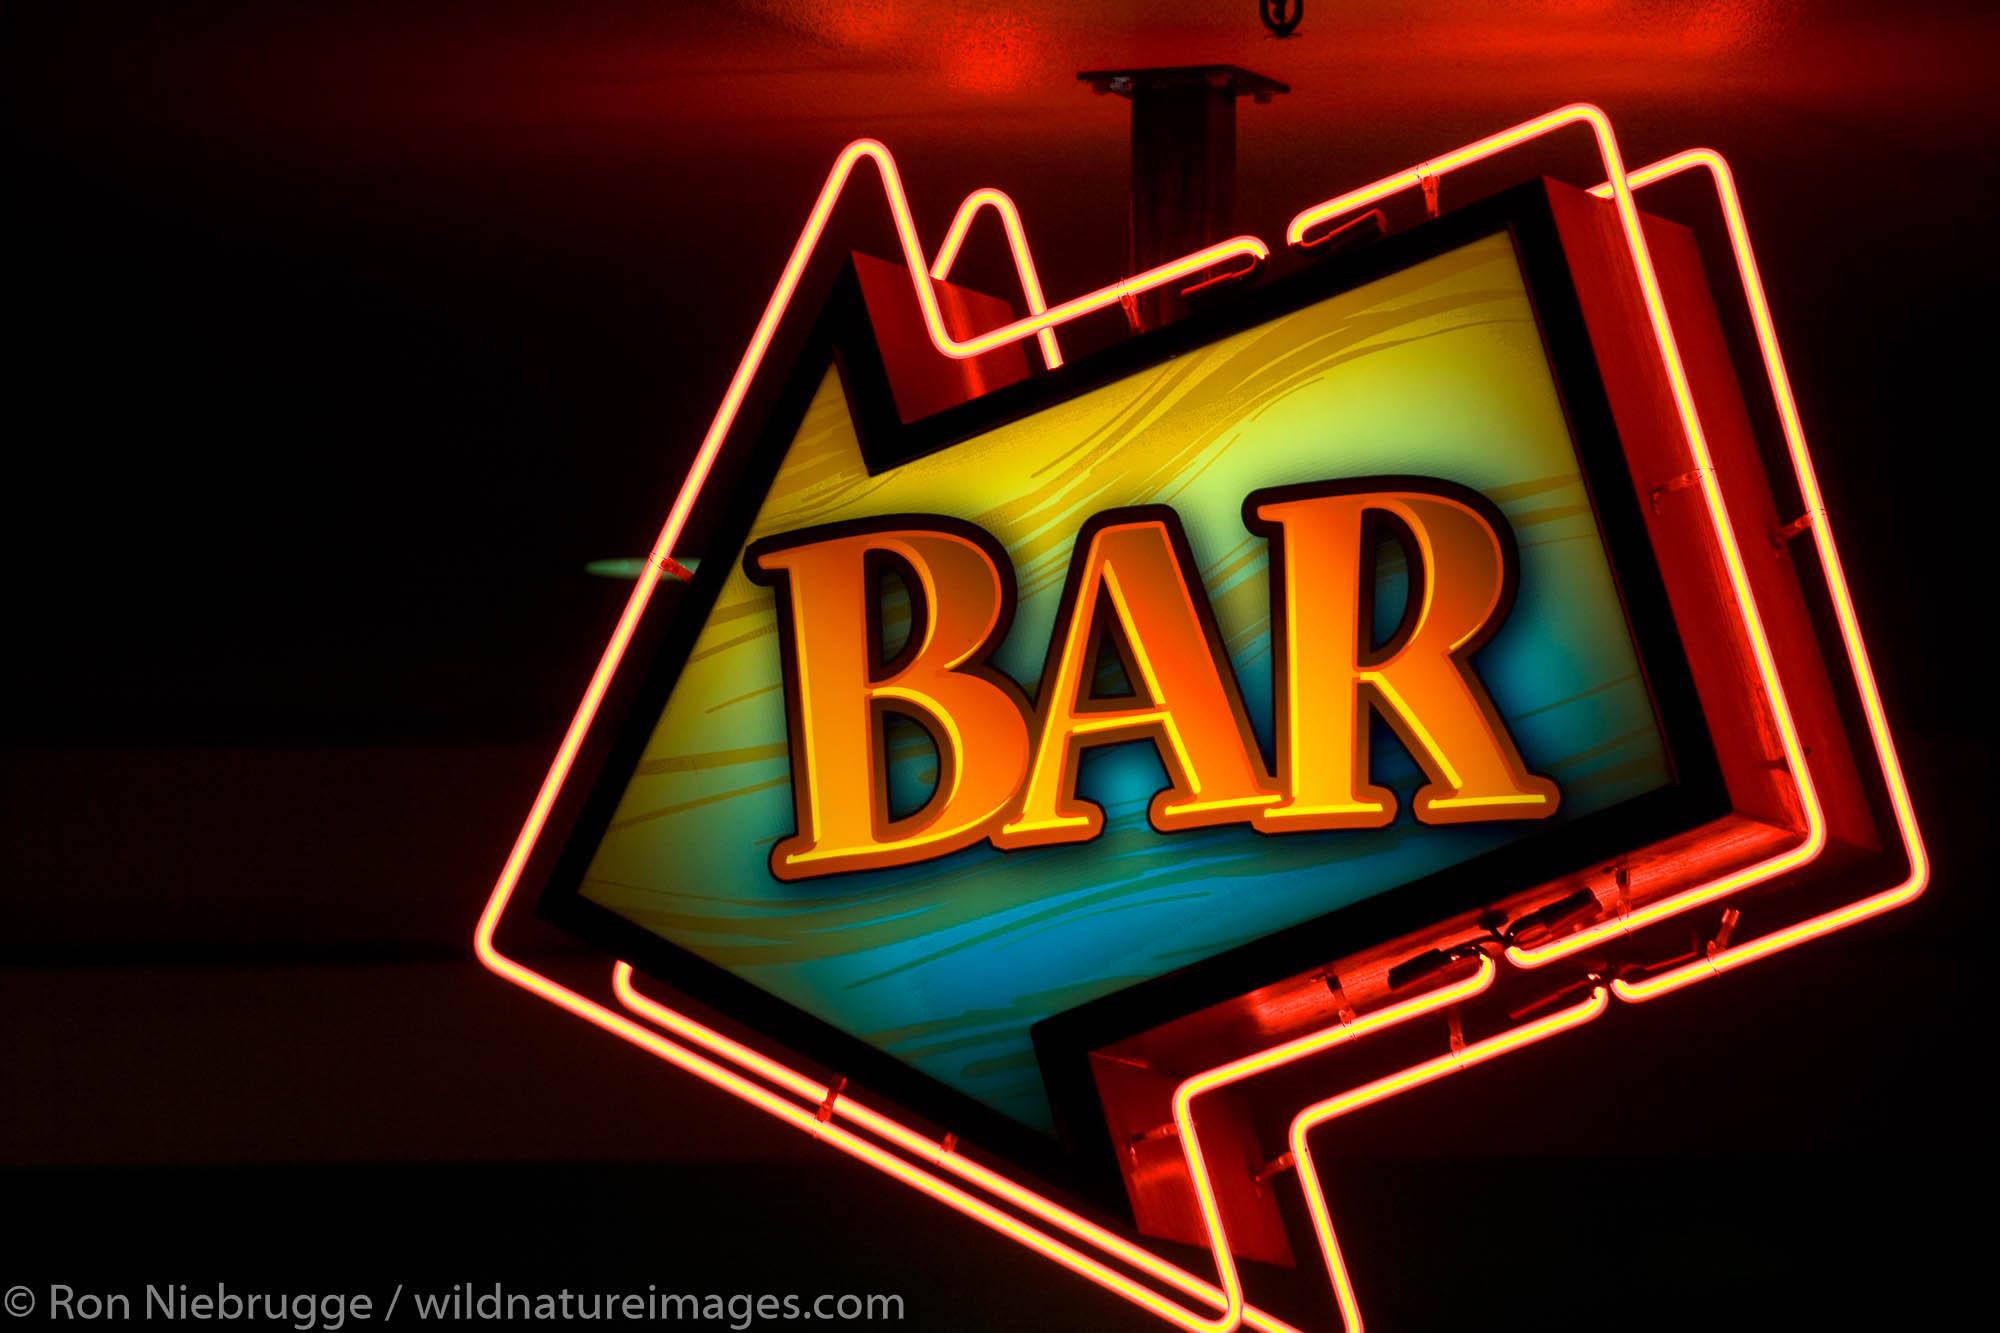 Bar neon sign, downtown Las Vegas, Nevada.